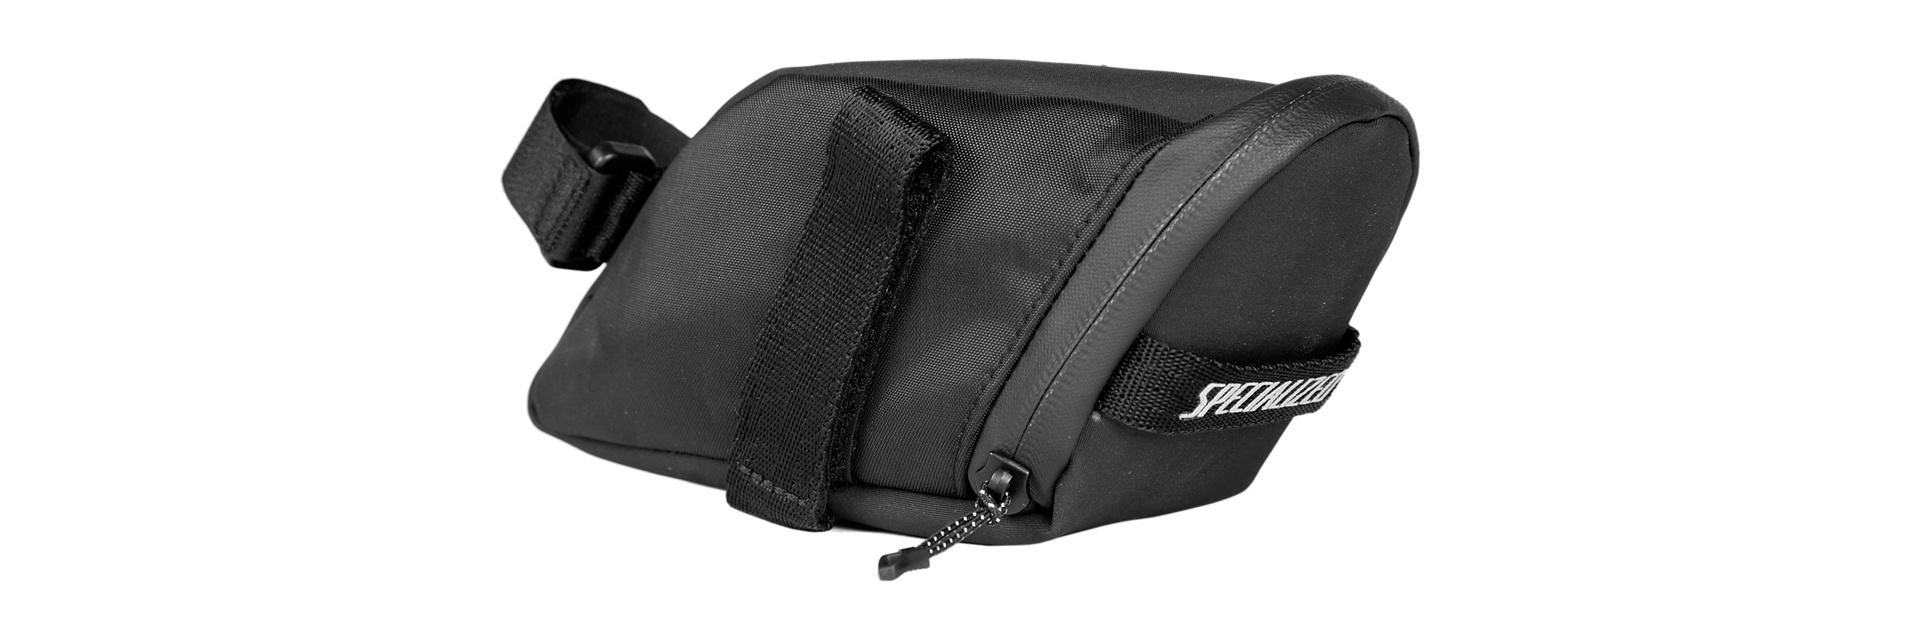 Specialized MINI WEDGIE SEAT BAG -Black